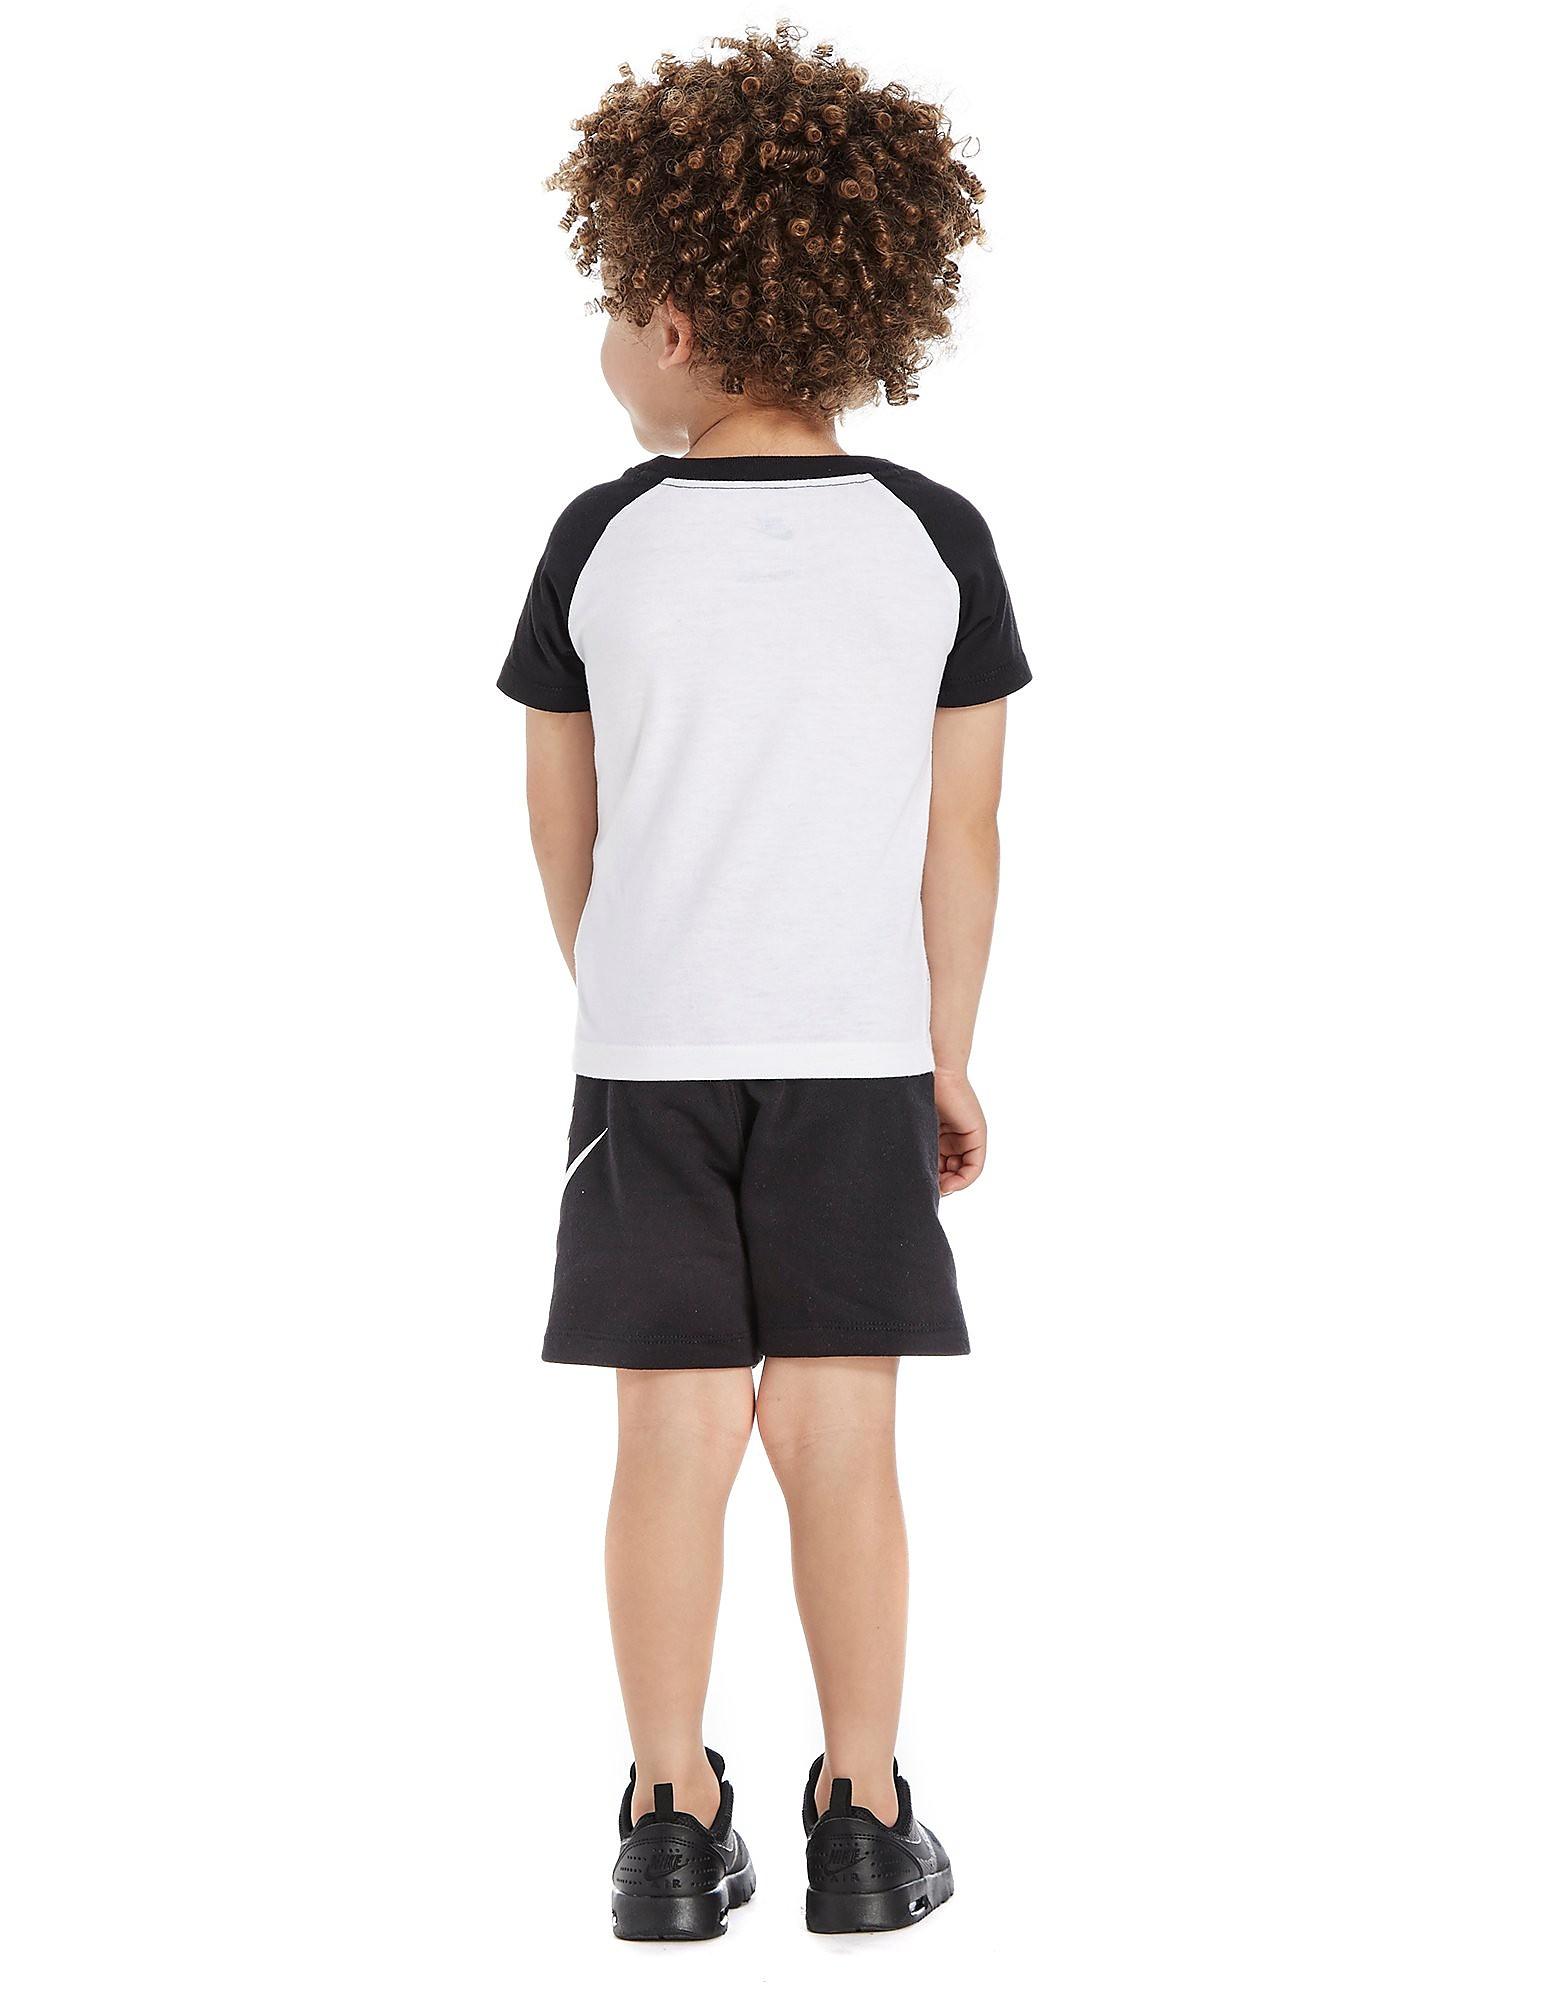 Nike Sportswear T-Shirt + Shorts Set Infant